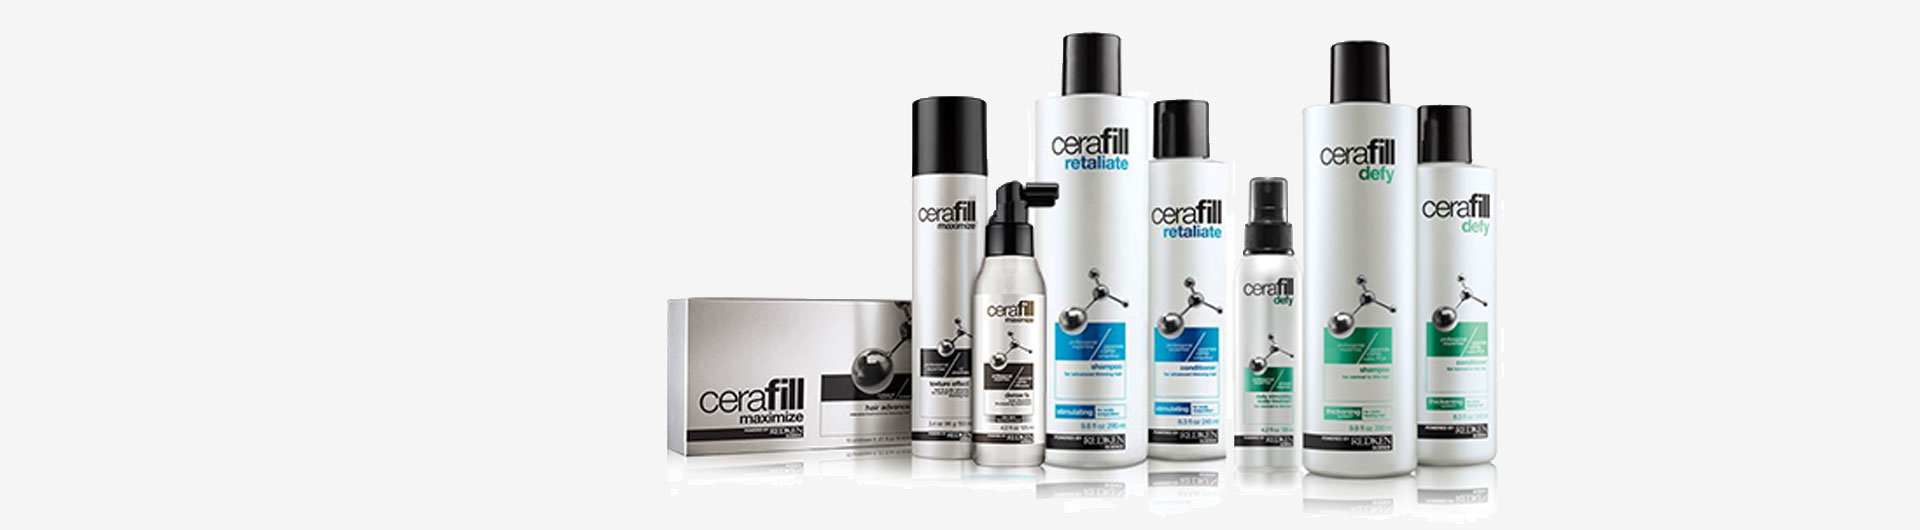 Redken Cerafill Preparati Protiv Opadanja Kose